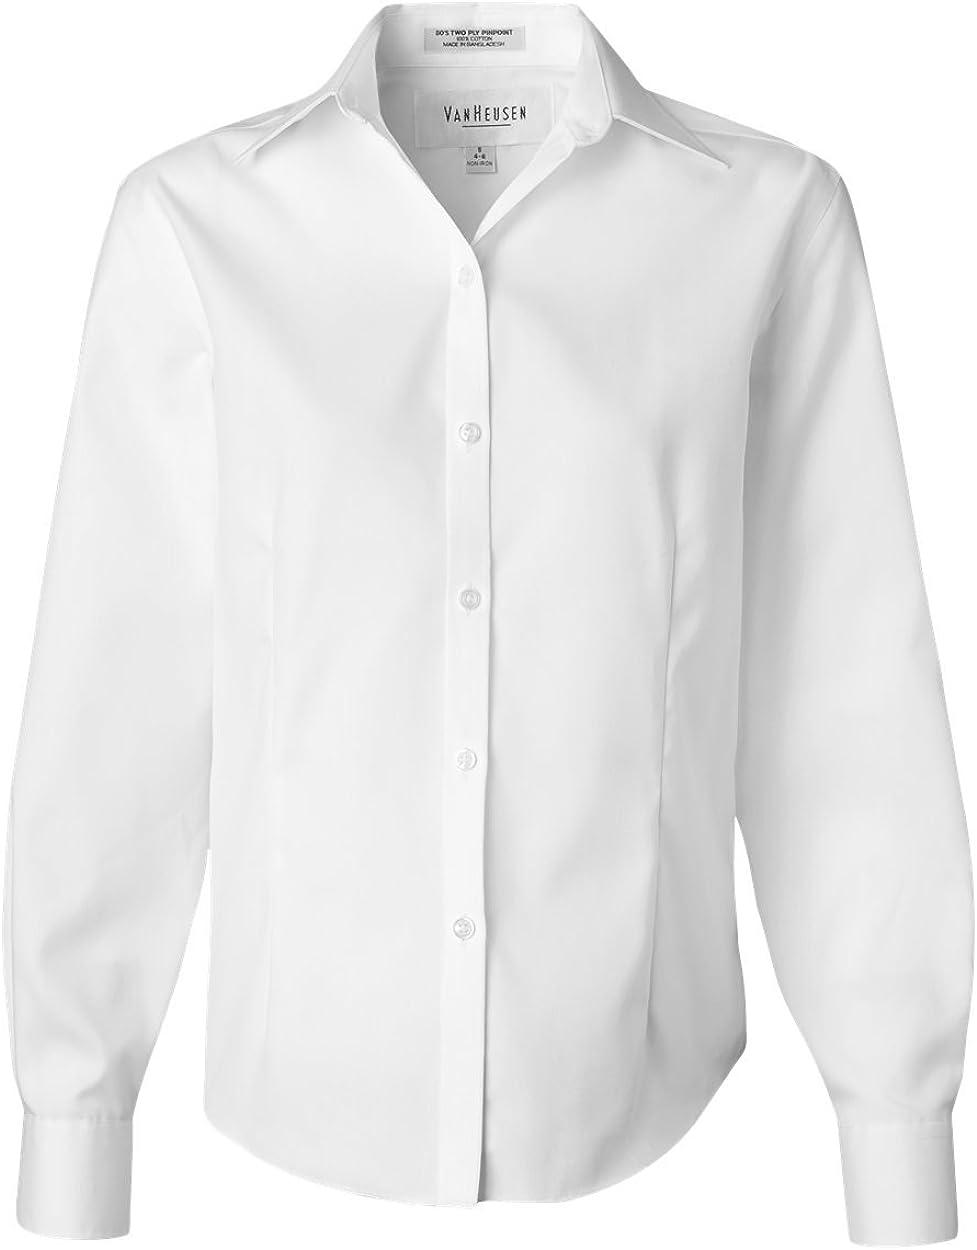 Van Heusen Women's Wrinkle Free Spread Collar Oxford Shirt